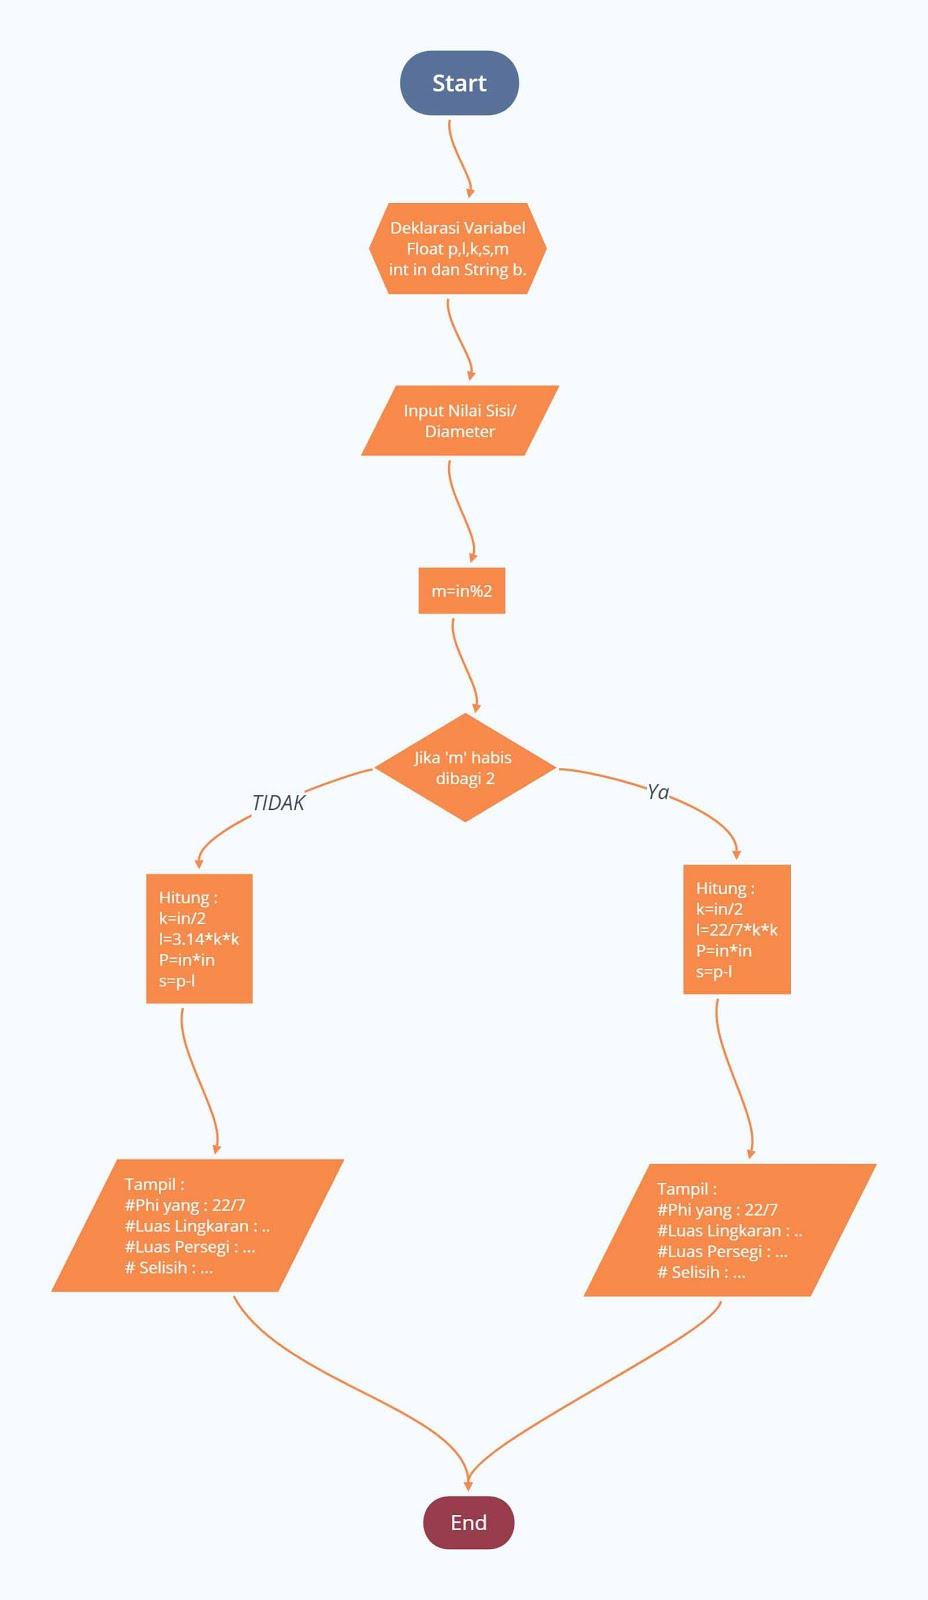 Flowchart Menghitung Selisih Luas Antara Lingkaran Dan Persegi